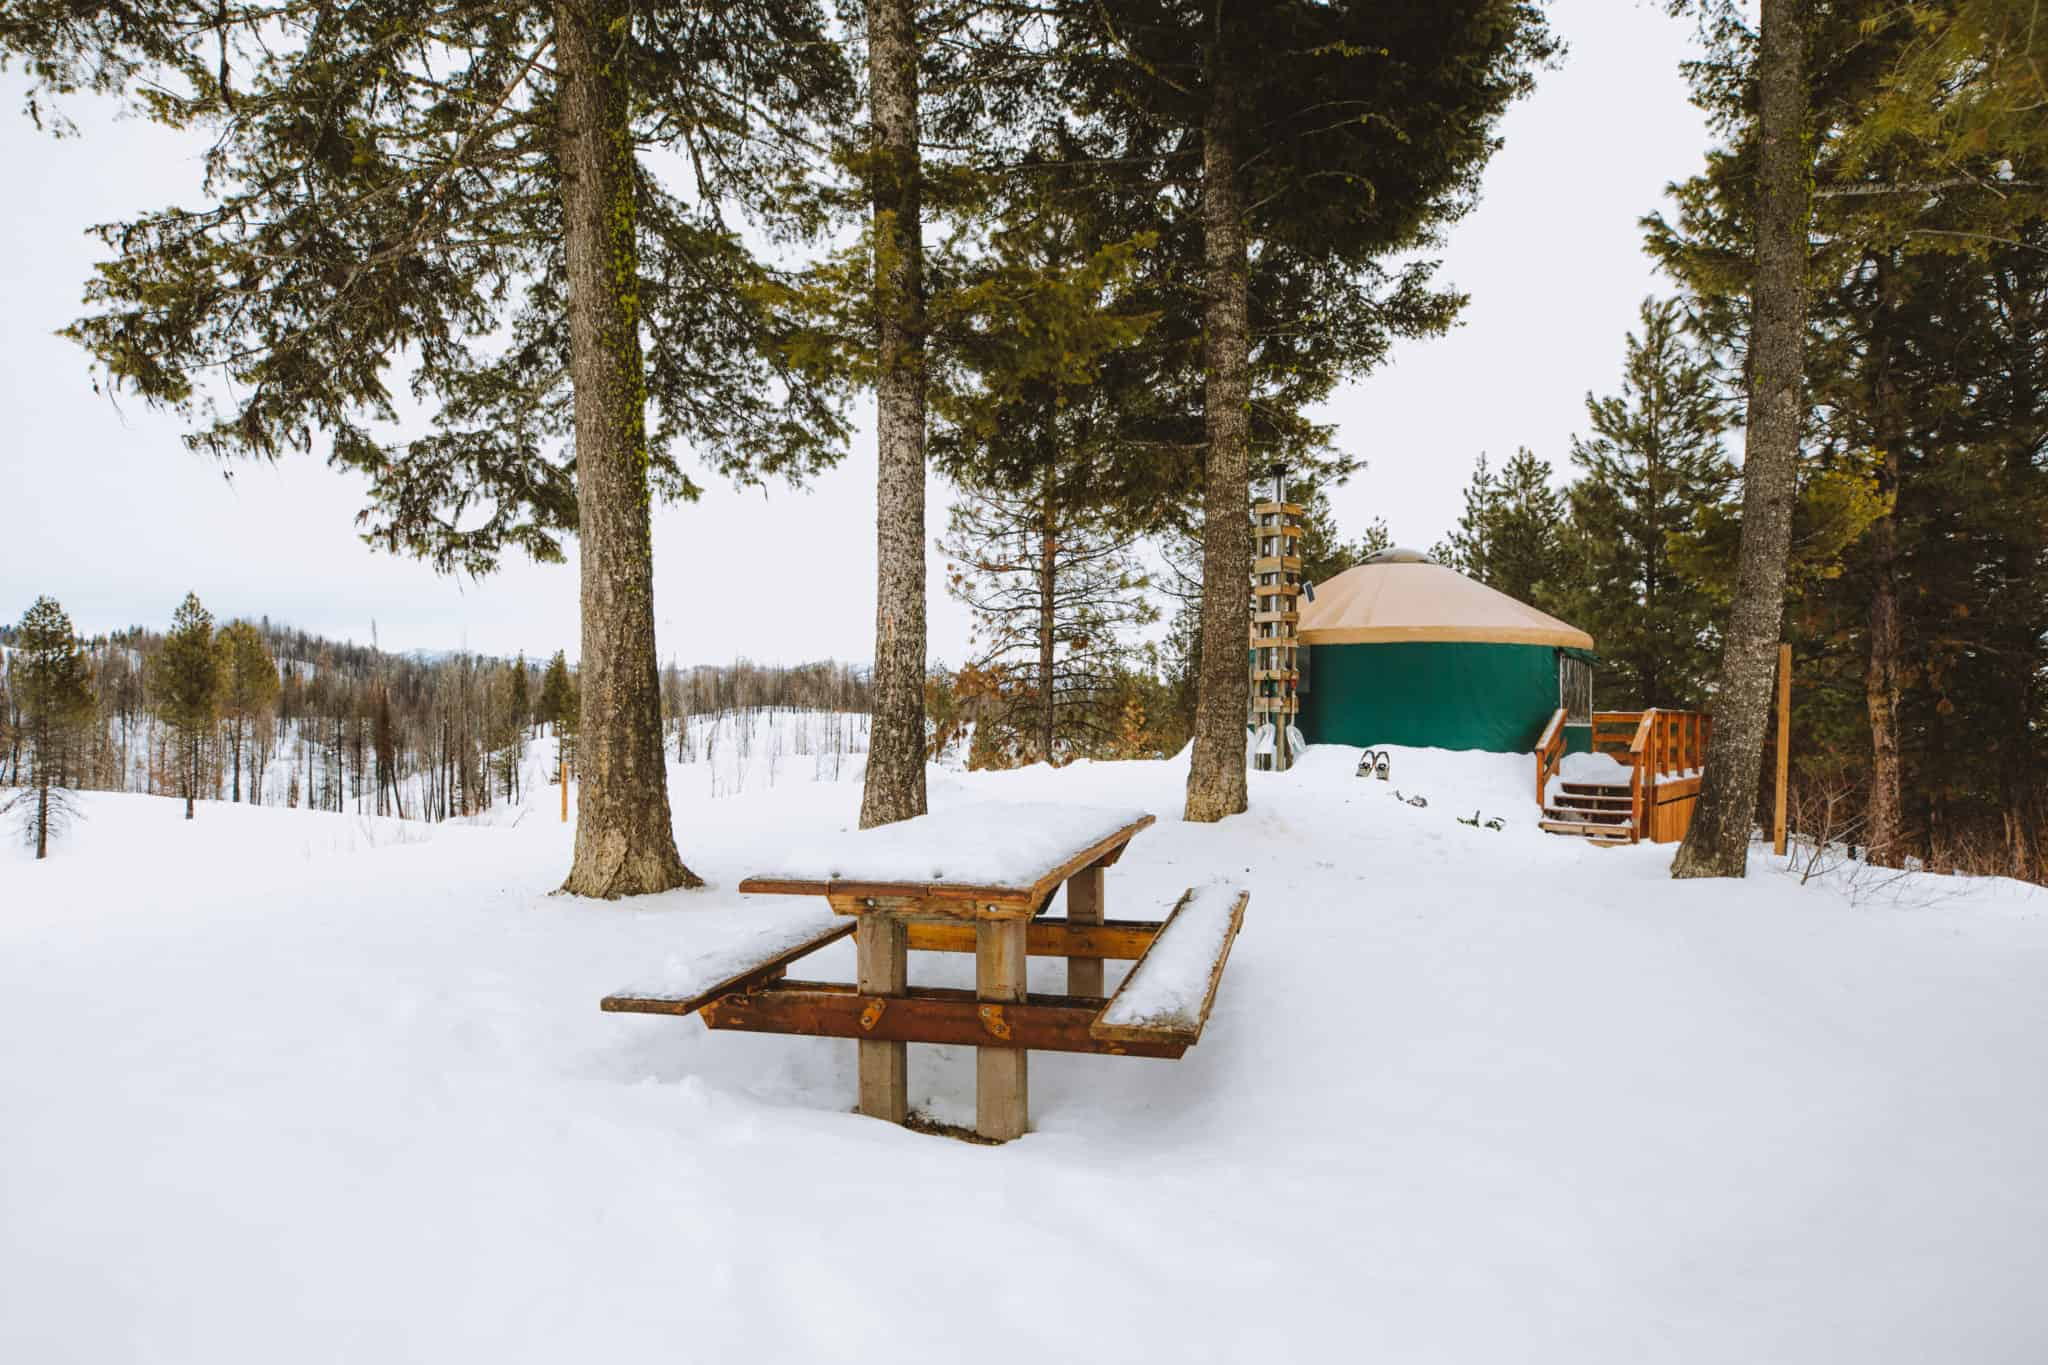 Idaho City yurt picnic table